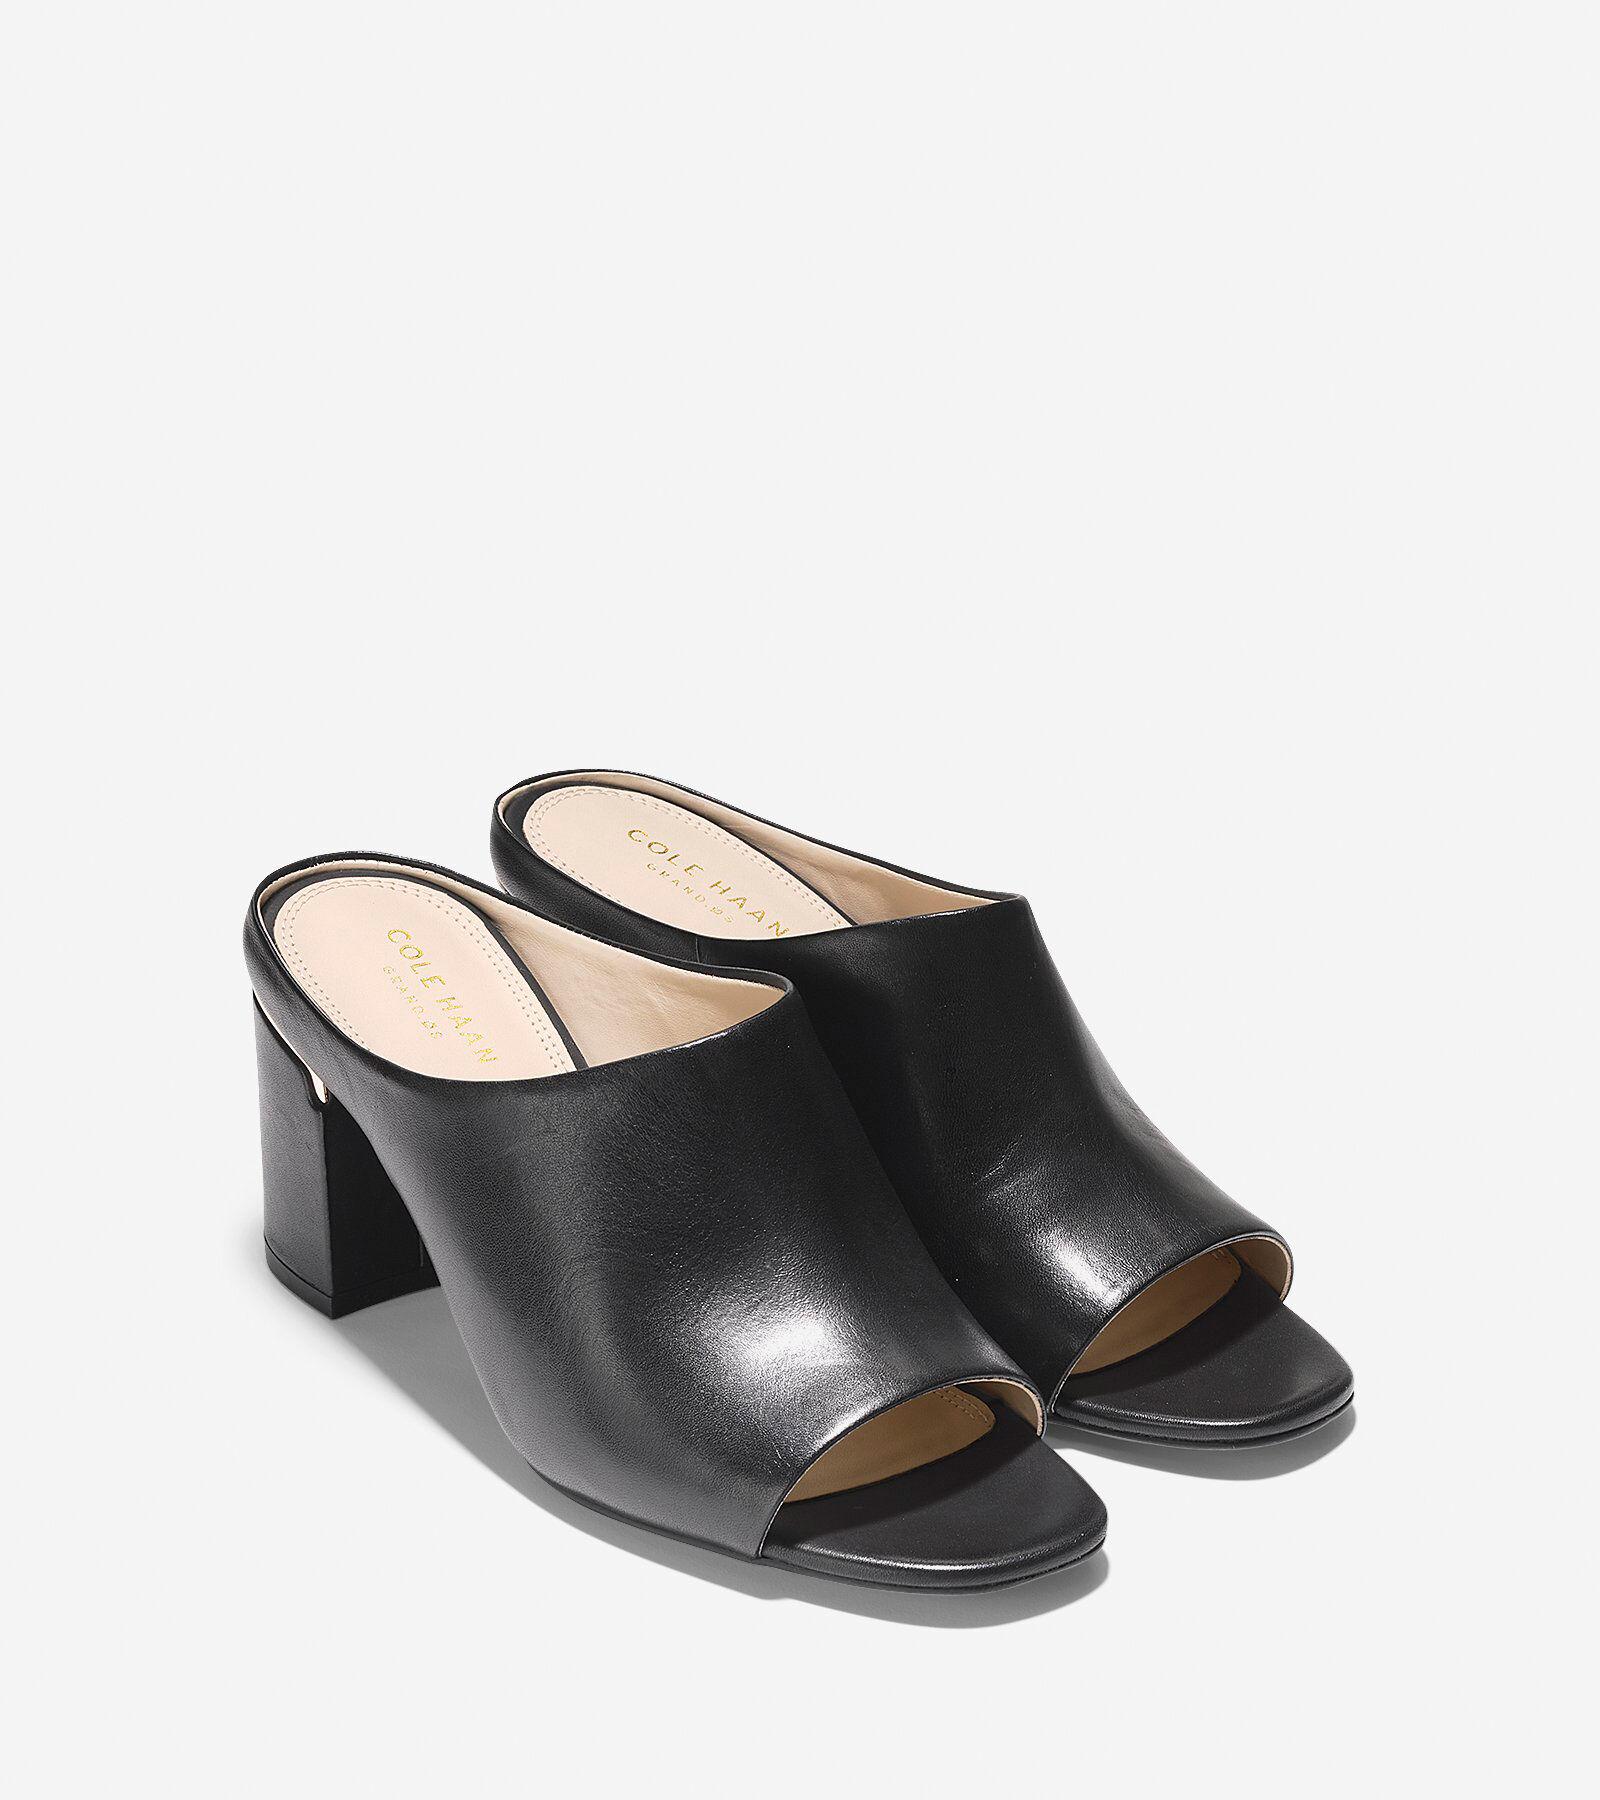 Cole Haan Laree Open Toe Sandals k5cNm